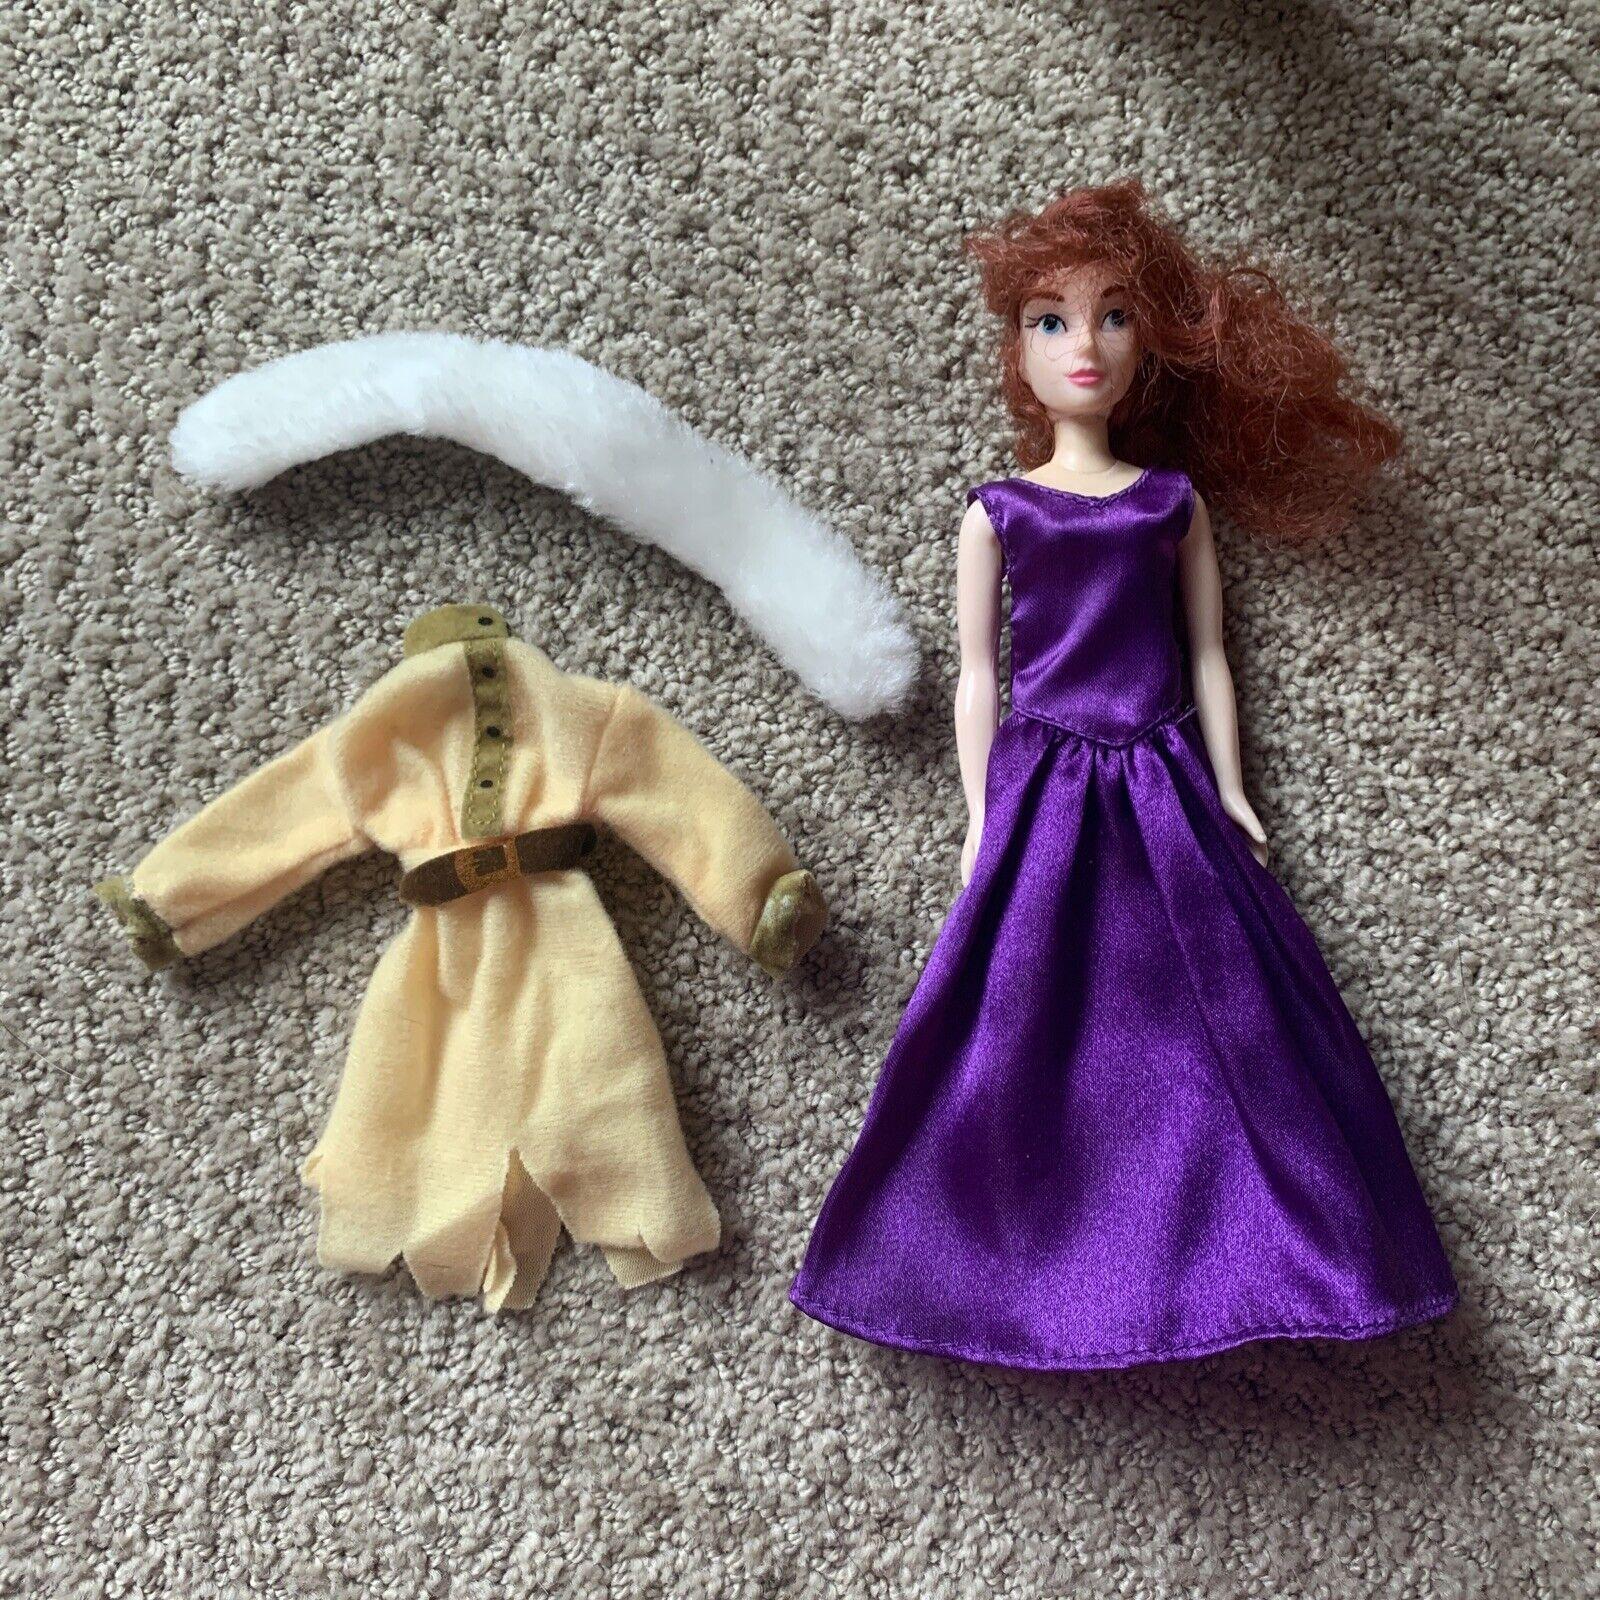 Anastasia Growing Hair Doll 20th Century Fox Purple Dress Peasant Outfit 1997